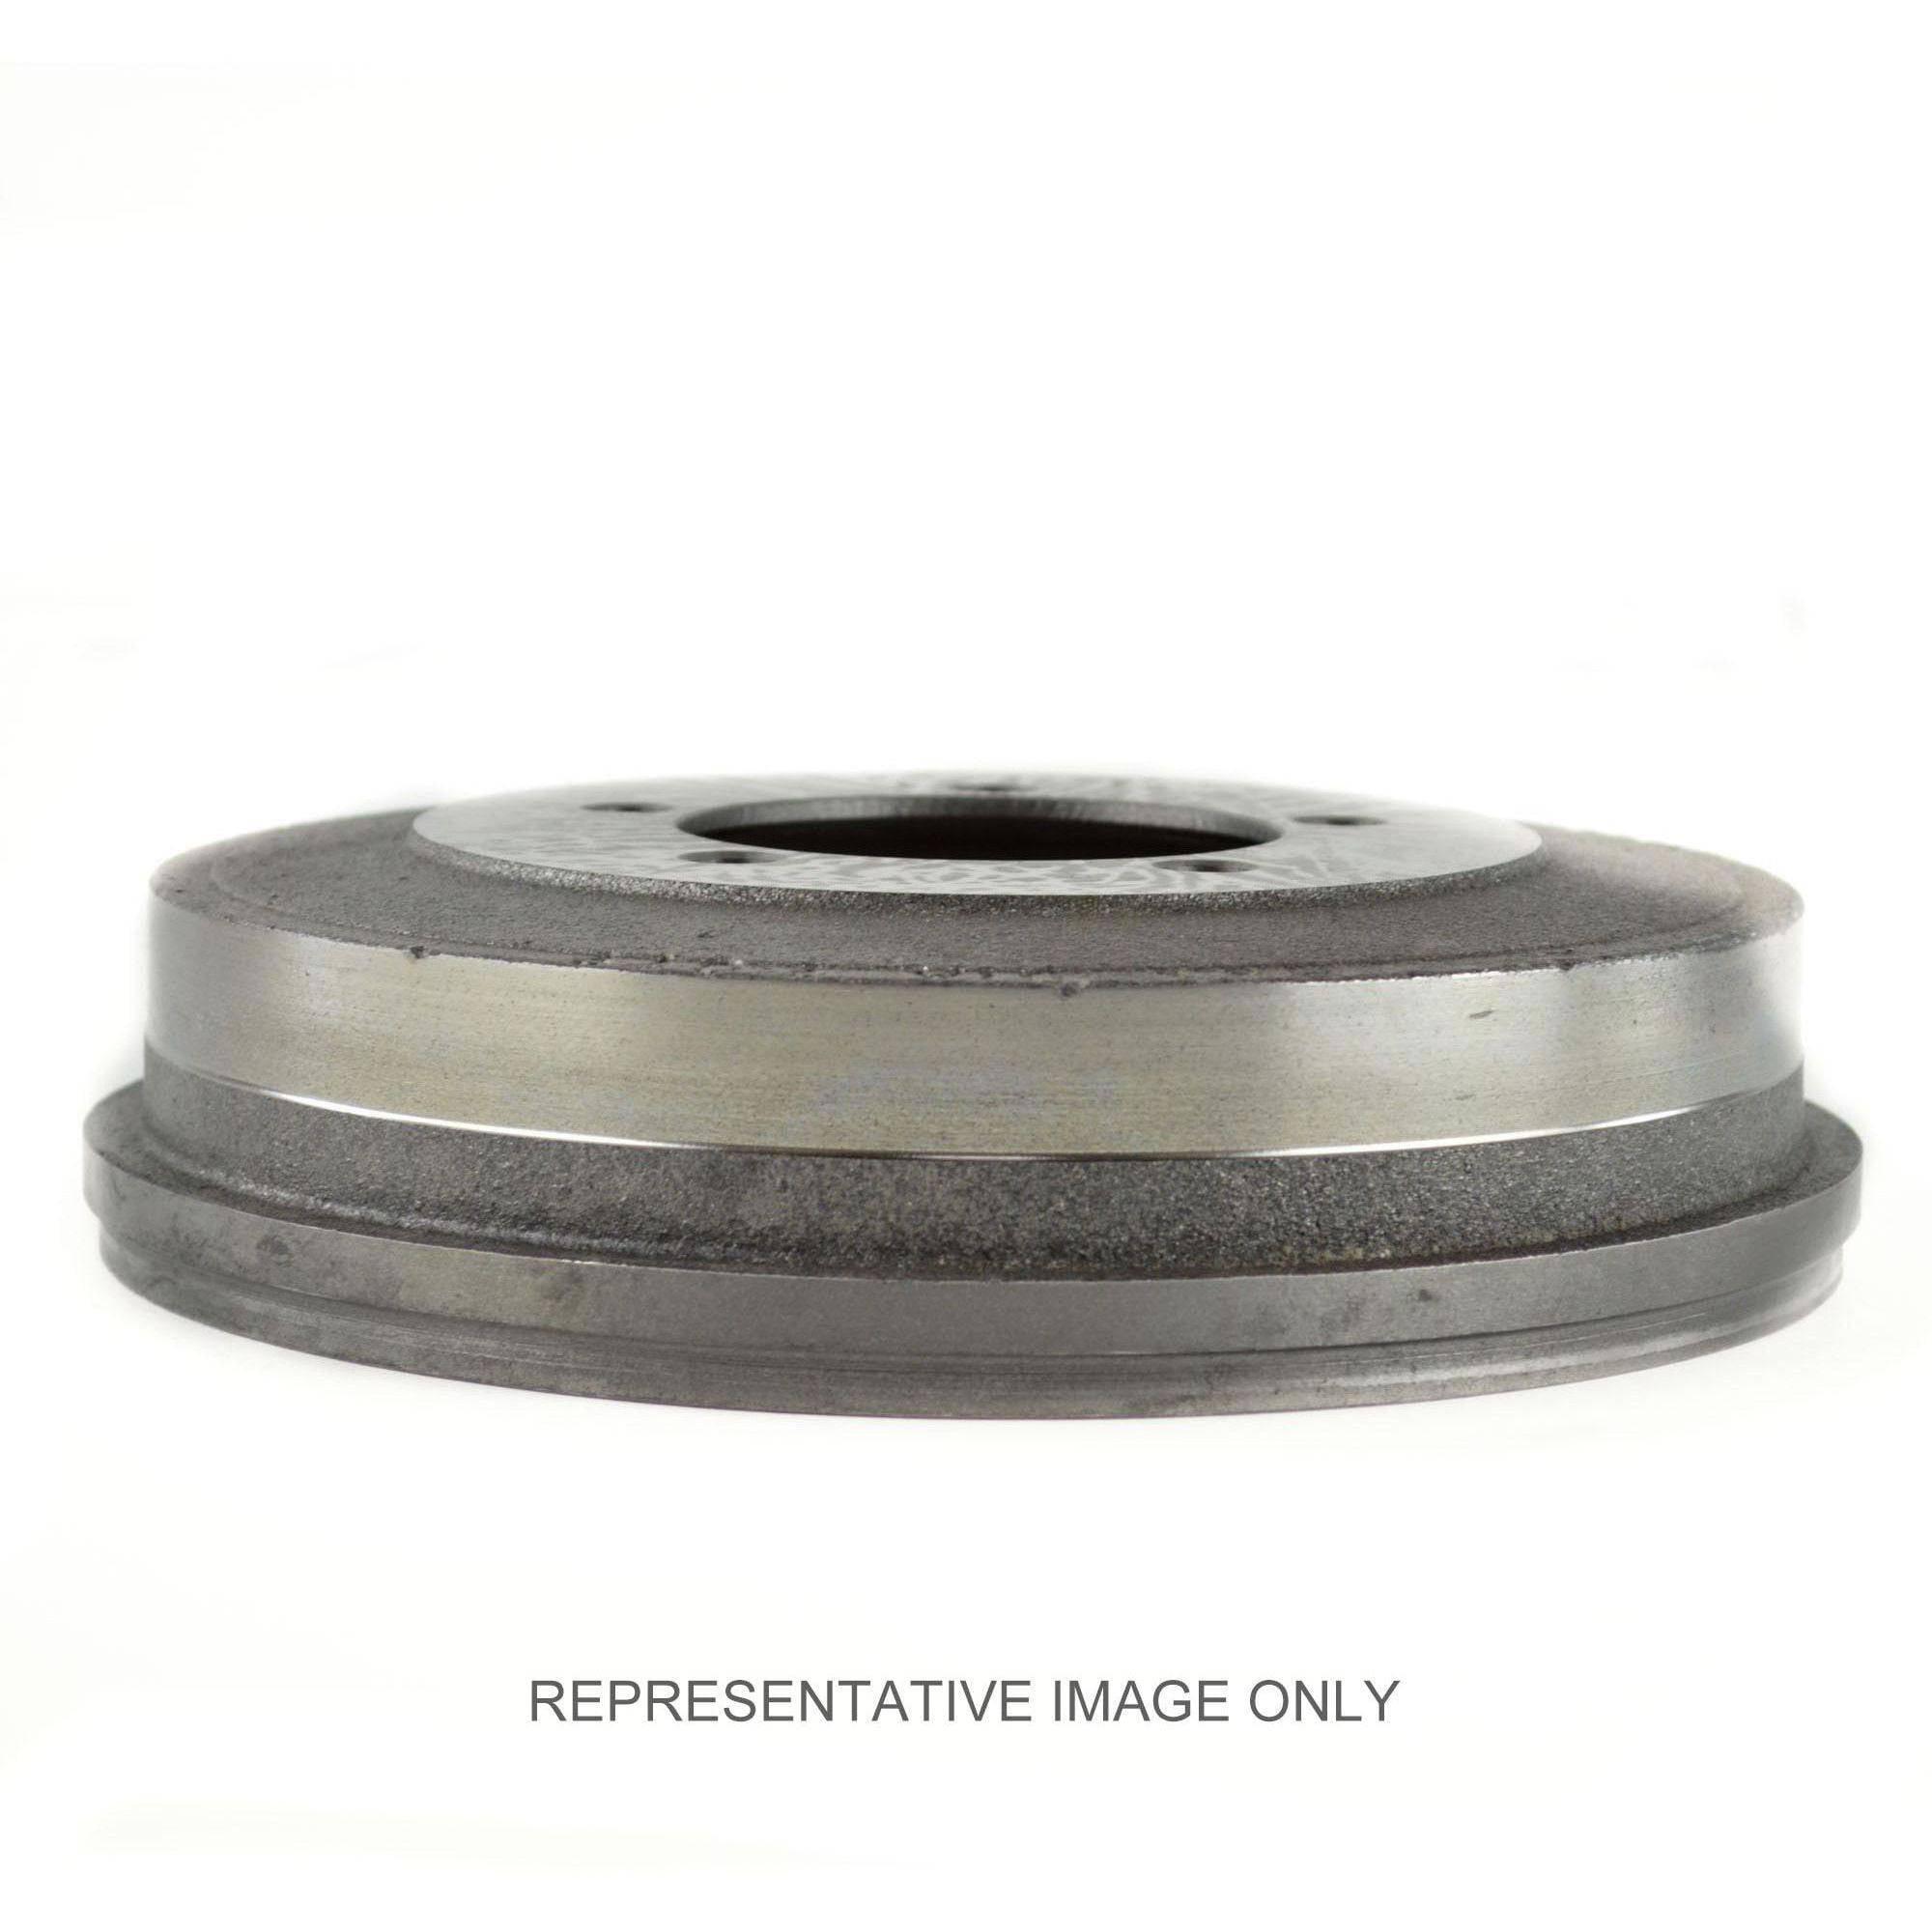 Centric Brake Drum, #122-25000